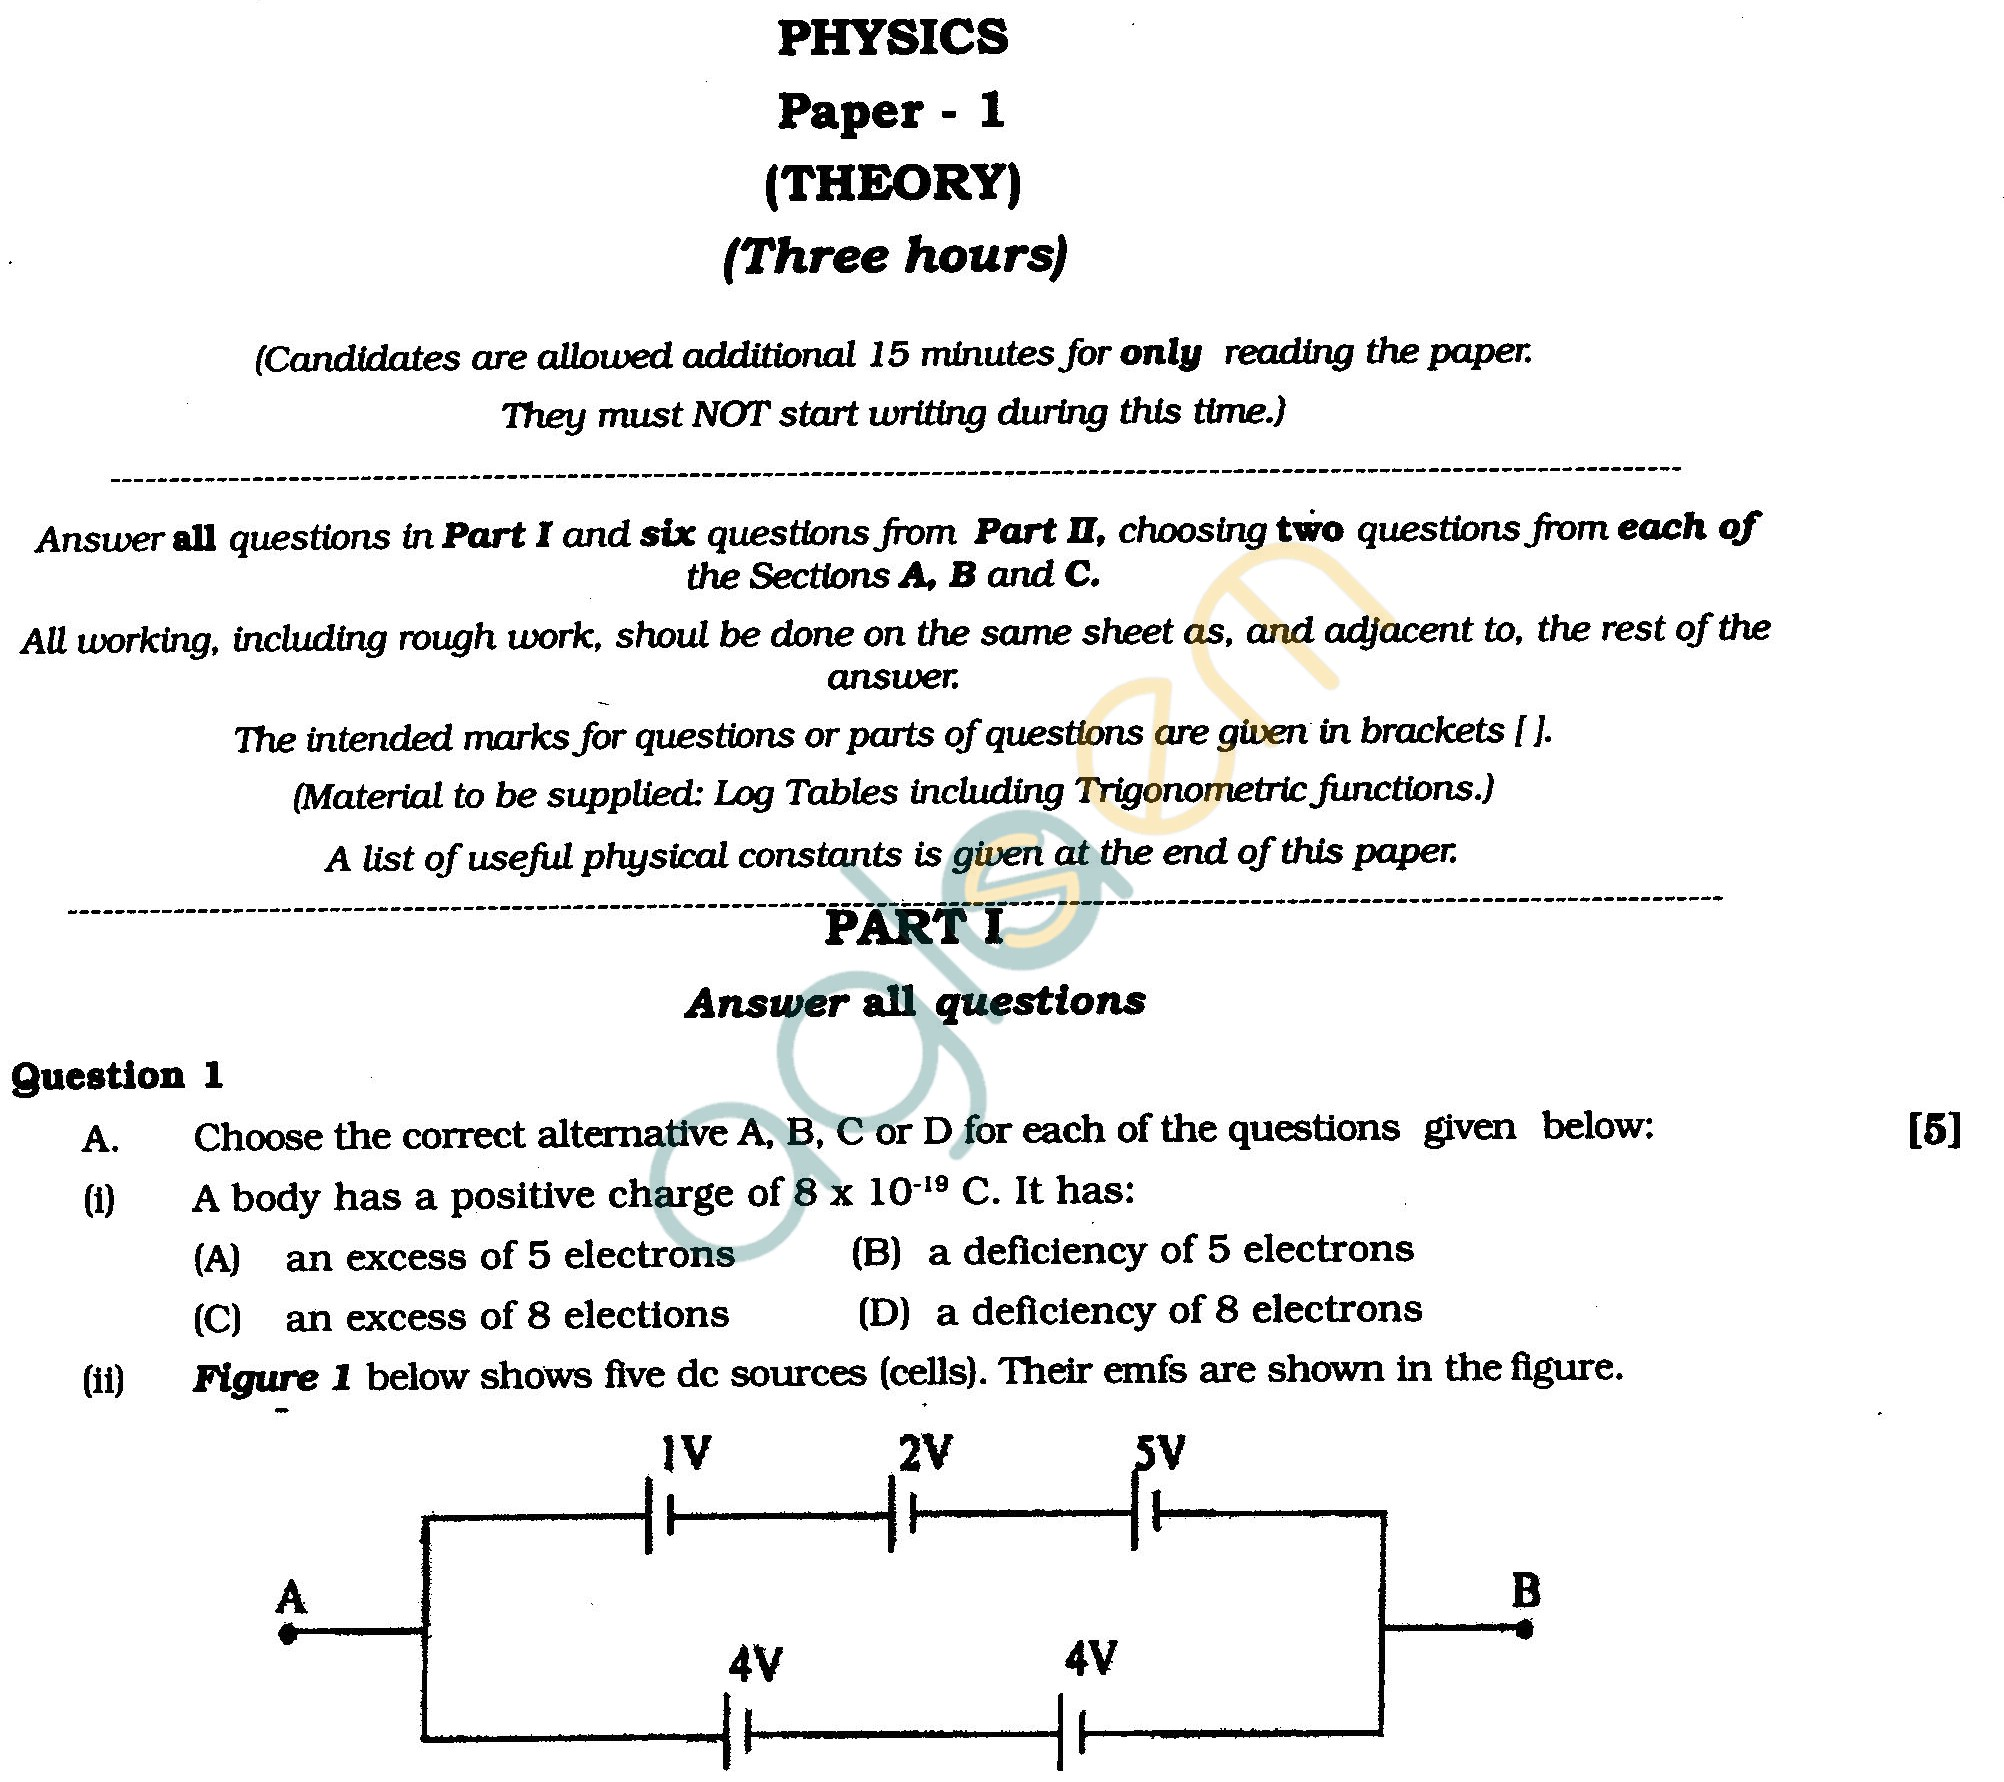 cbse class 12 physics board question paper 2019 pdf